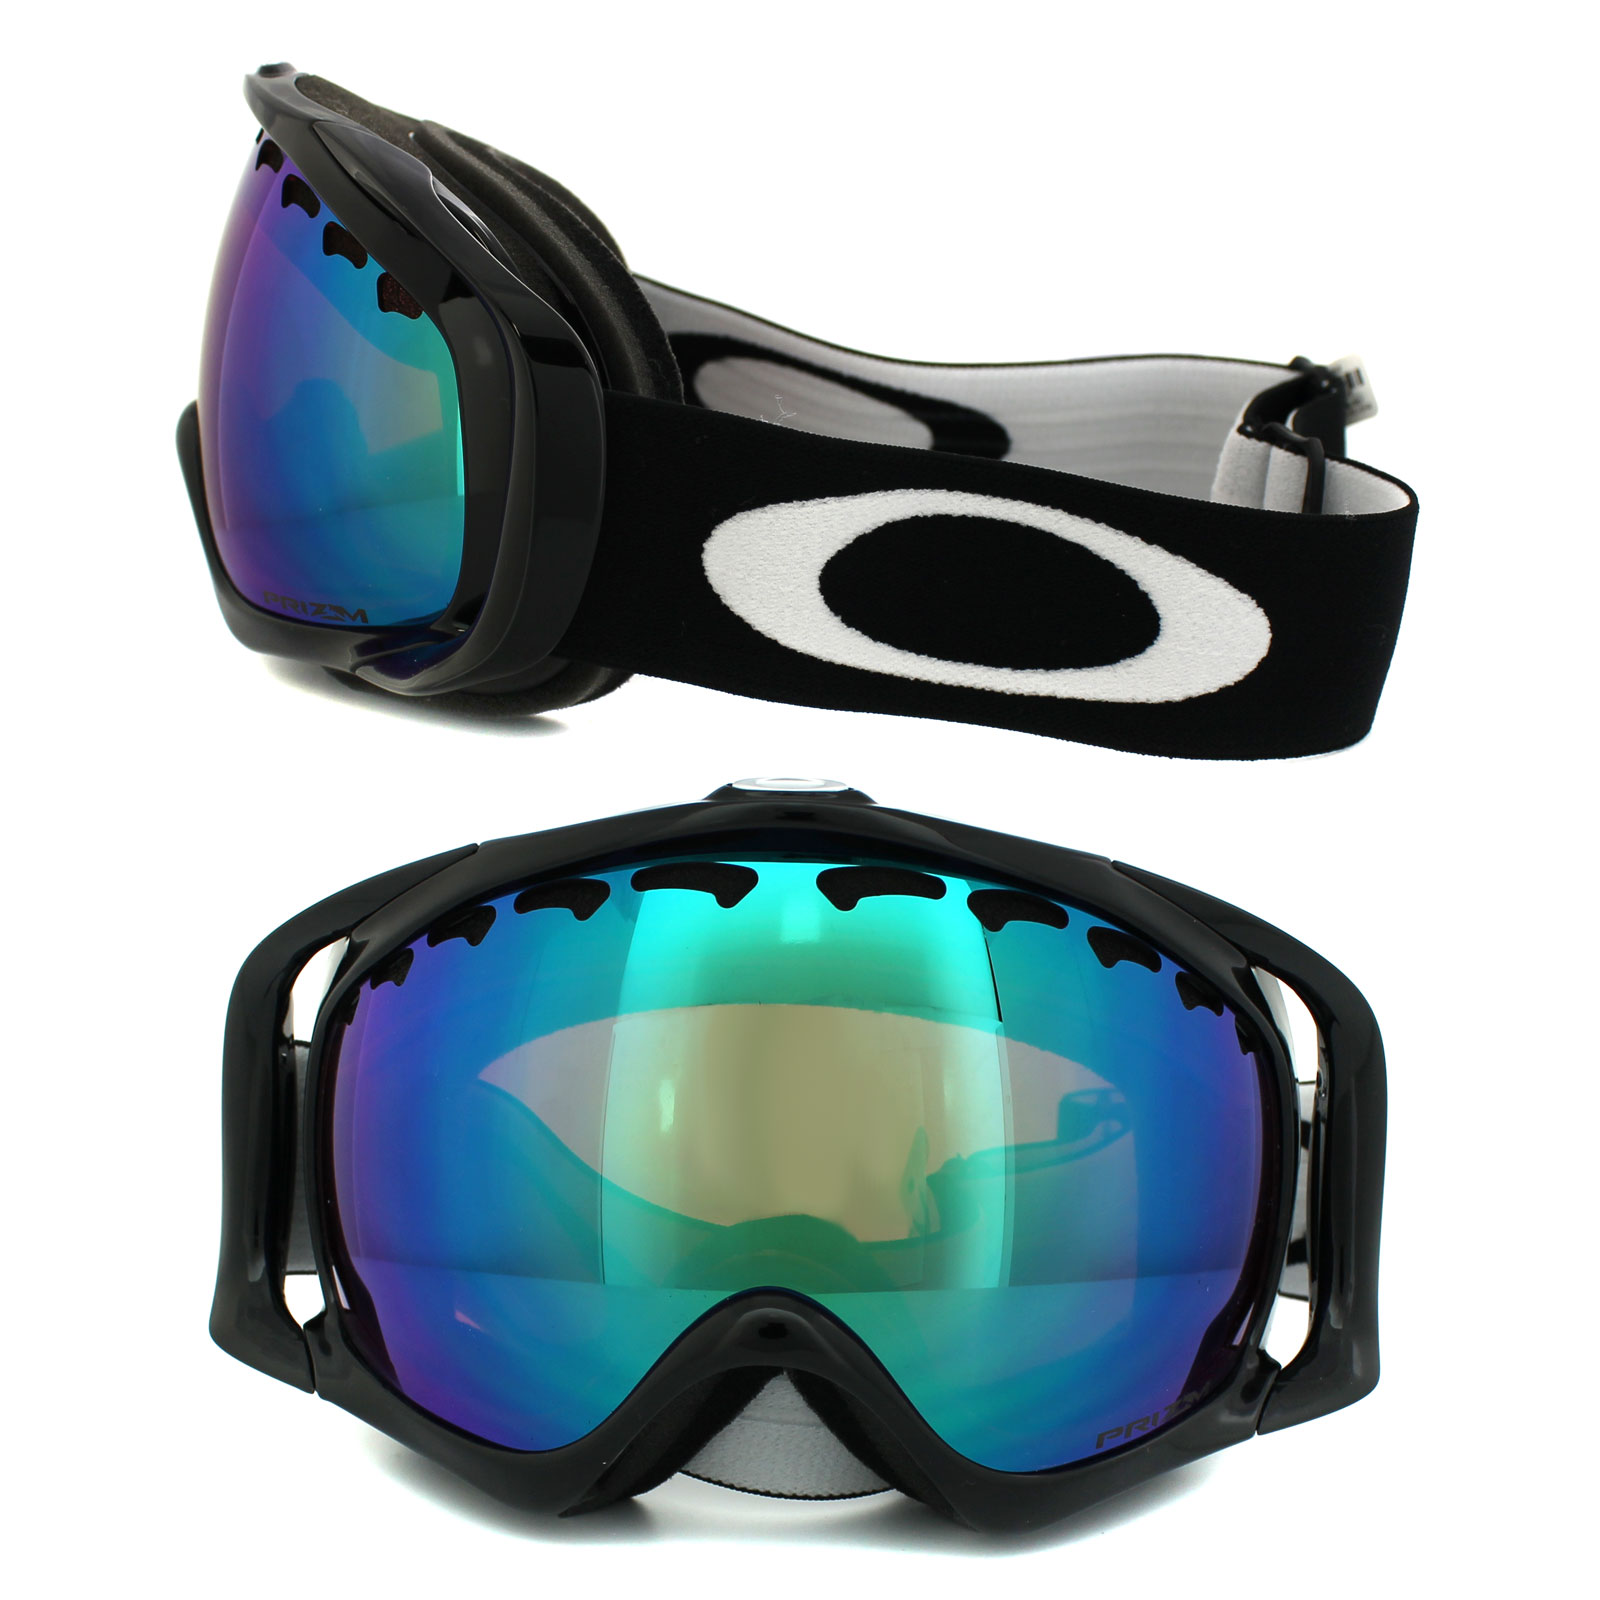 d3a1381e4f1e Sentinel Oakley Ski Snow Goggles Crowbar OO7005-02 Jet Black Prizm Jade  Iridium